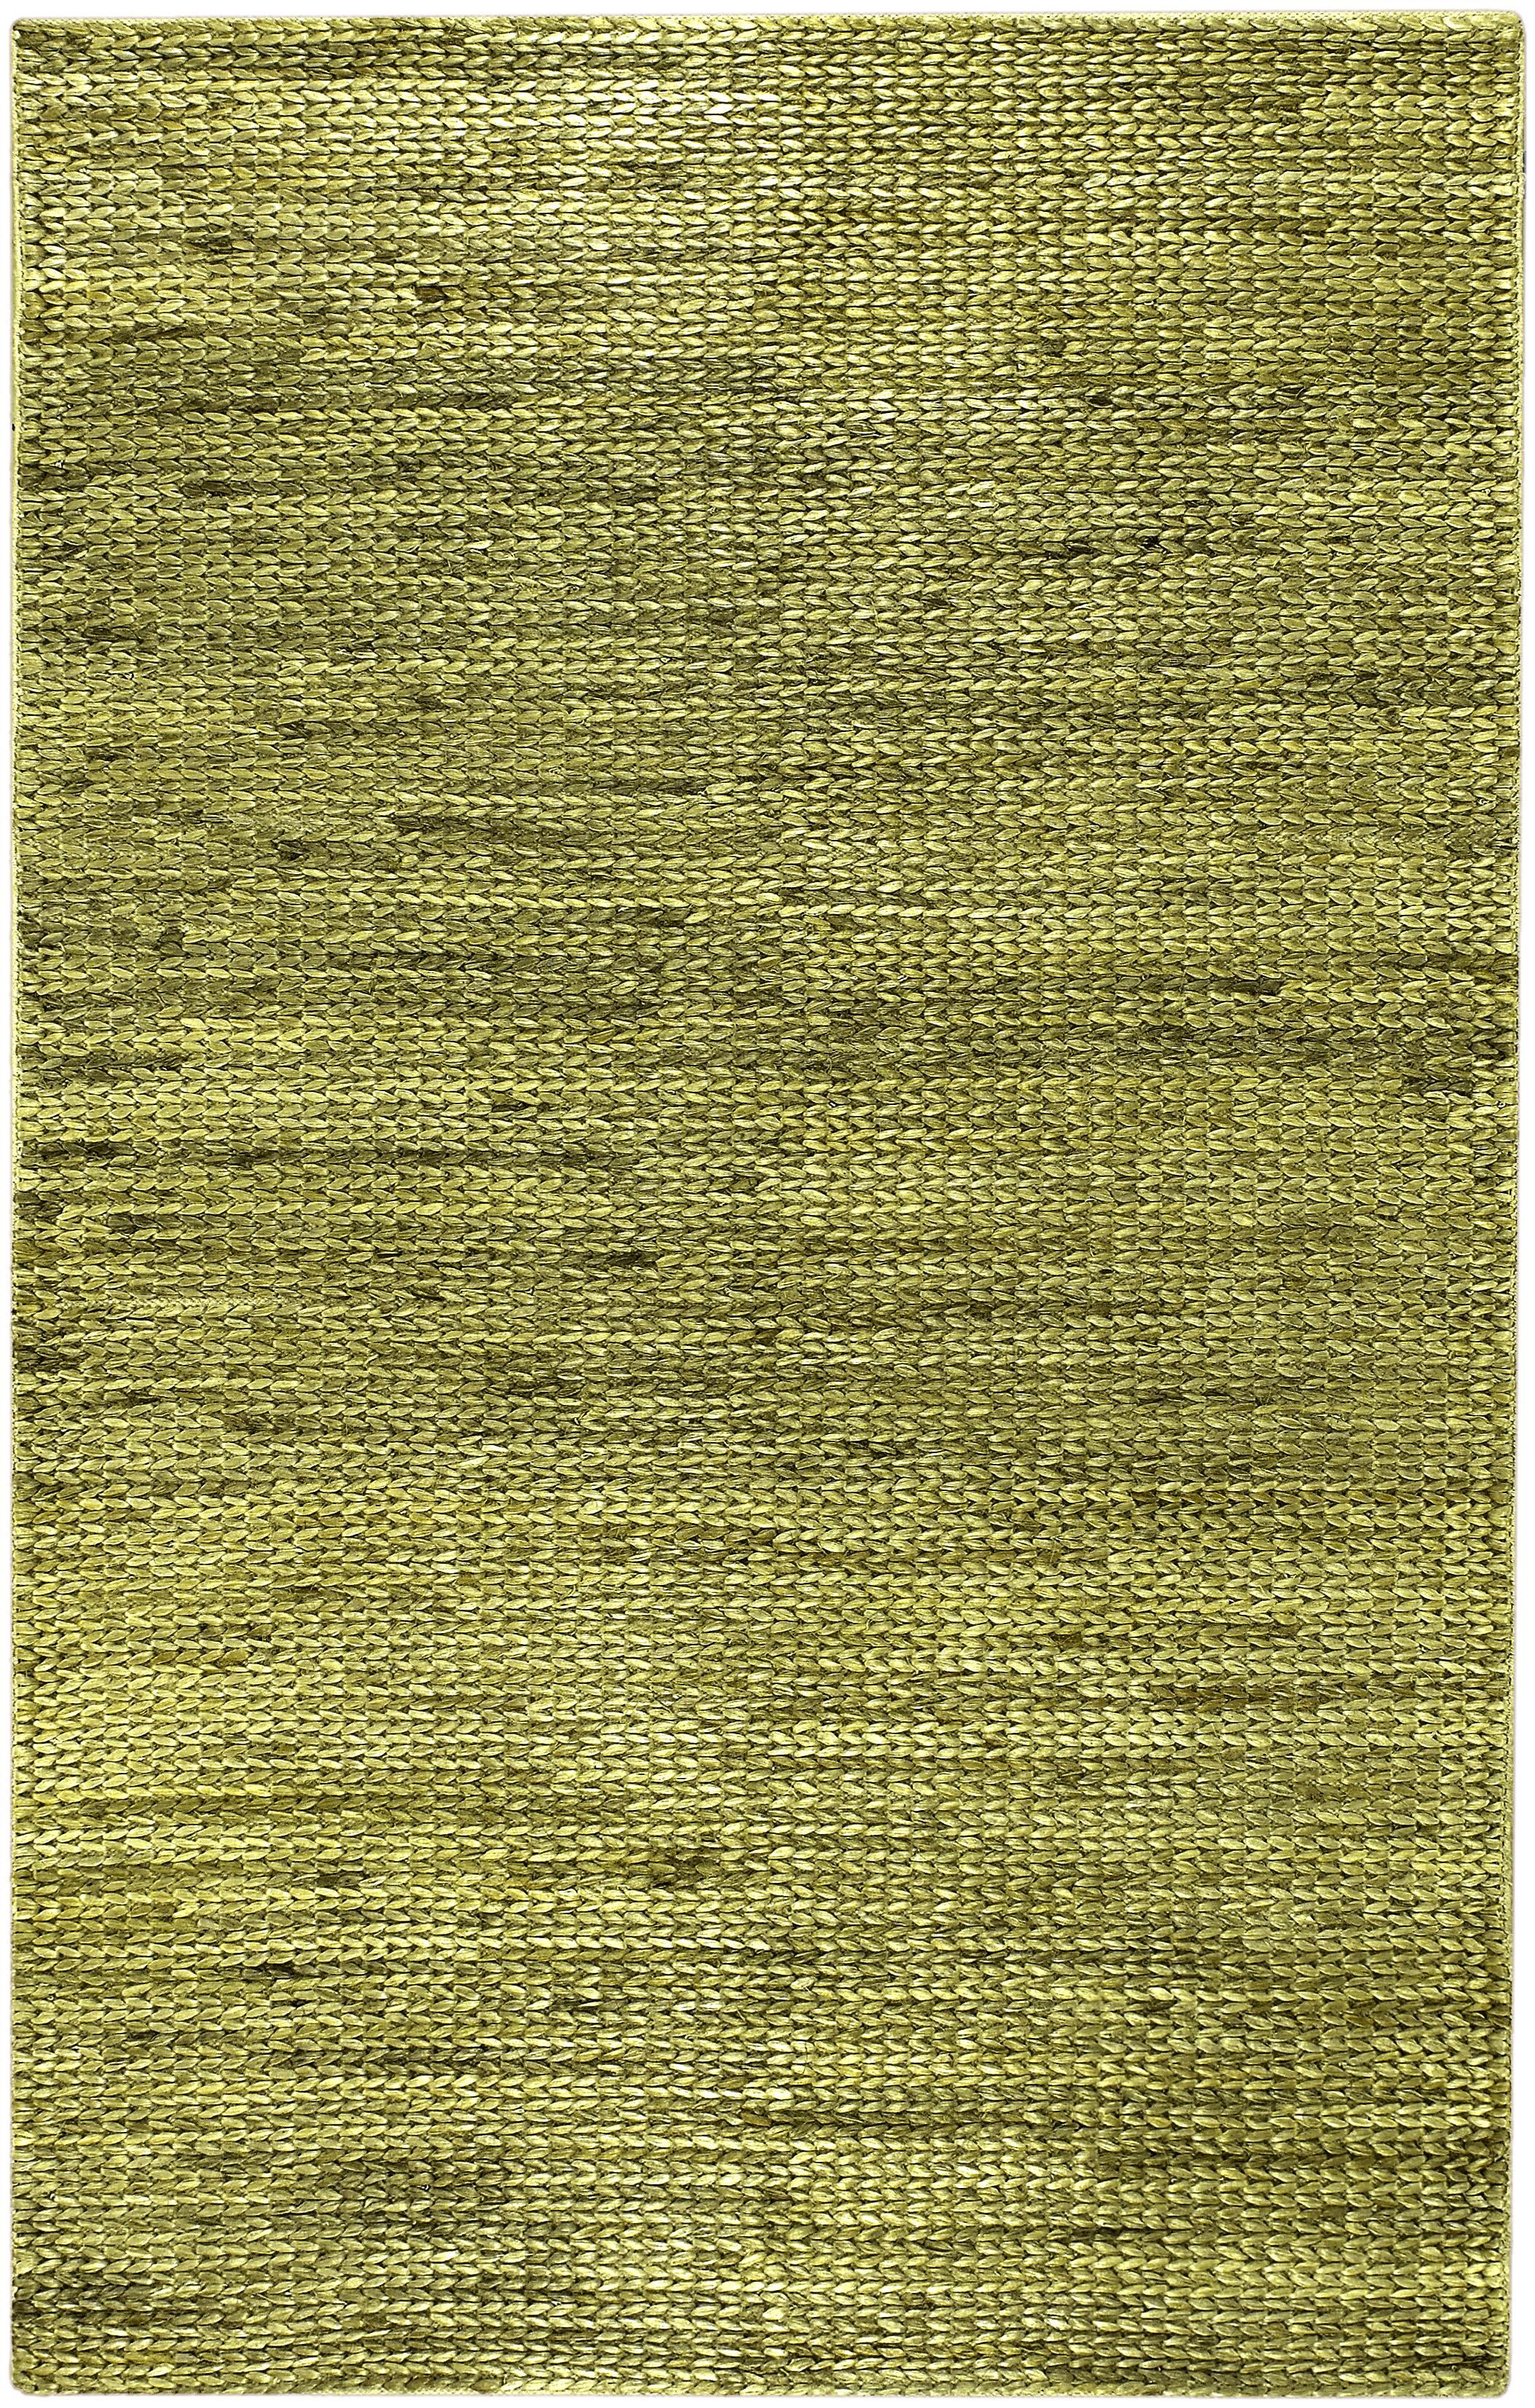 Surya Rugs Tropics 8' x 11' - Item Number: TRO1029-811